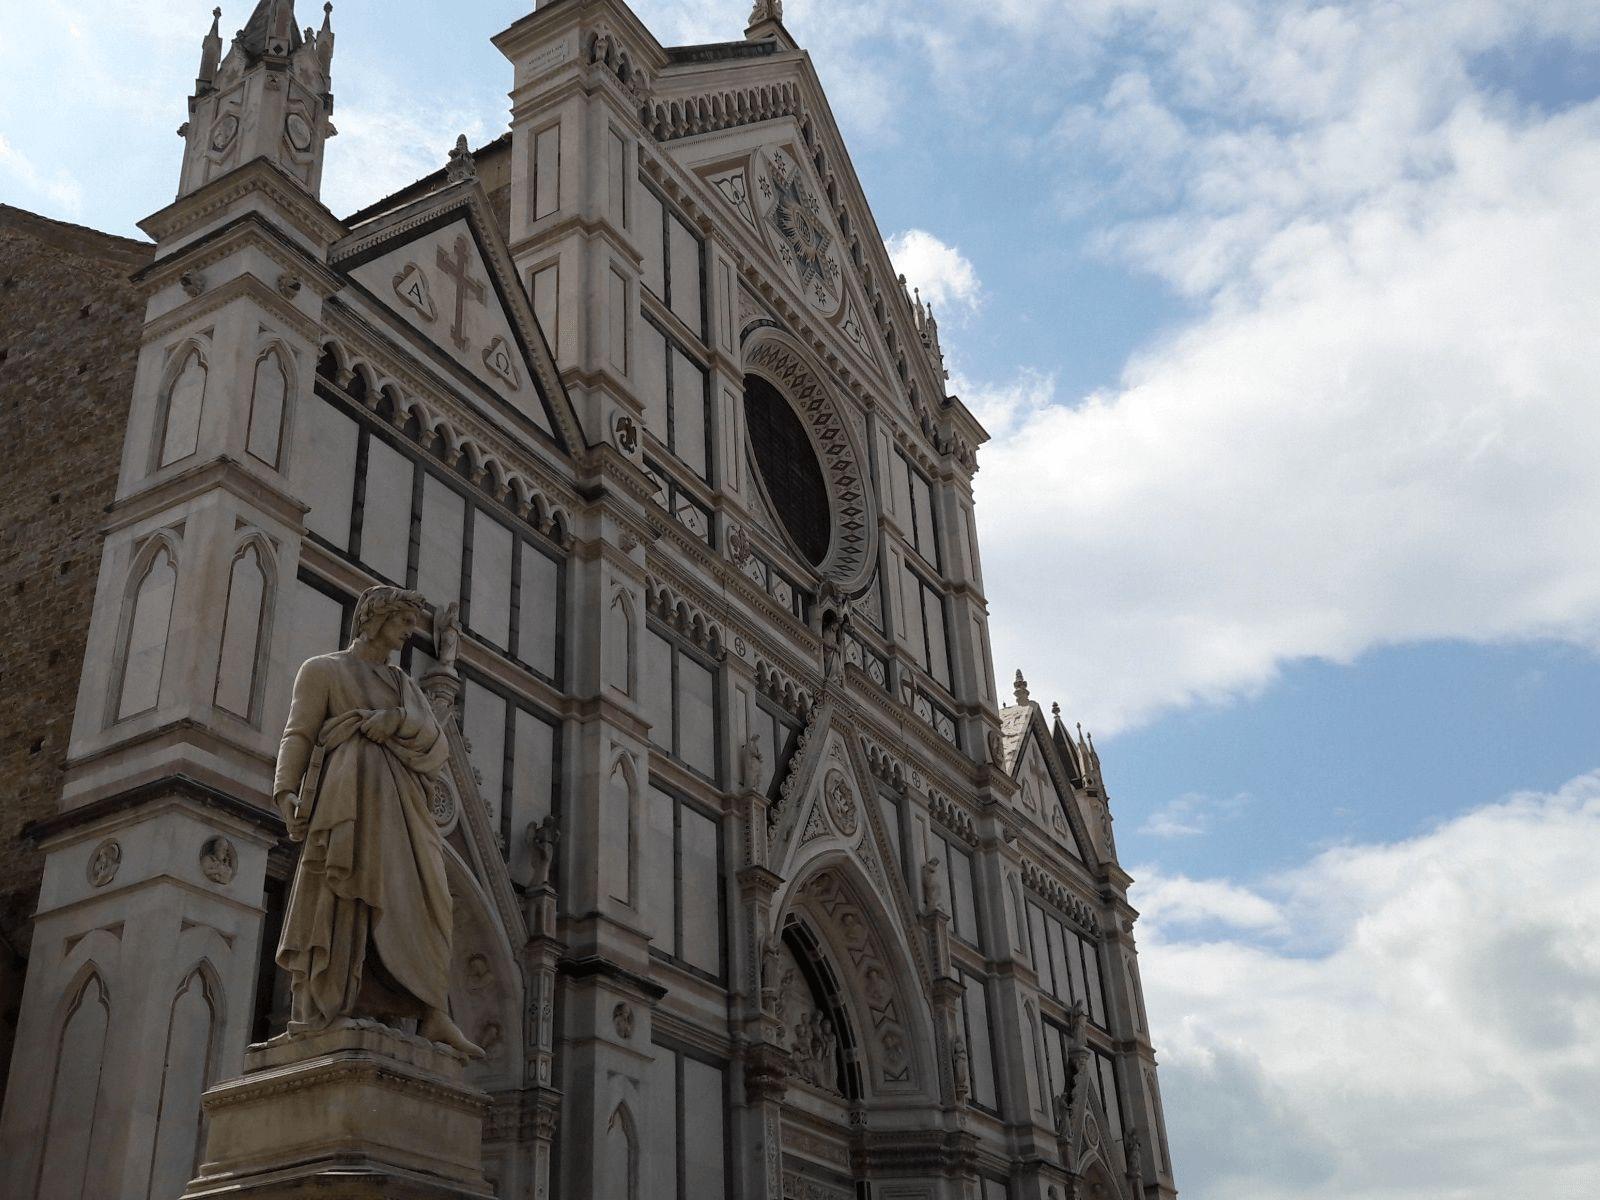 Toskana i Firenca: Firenca: bazilika Santa Croce